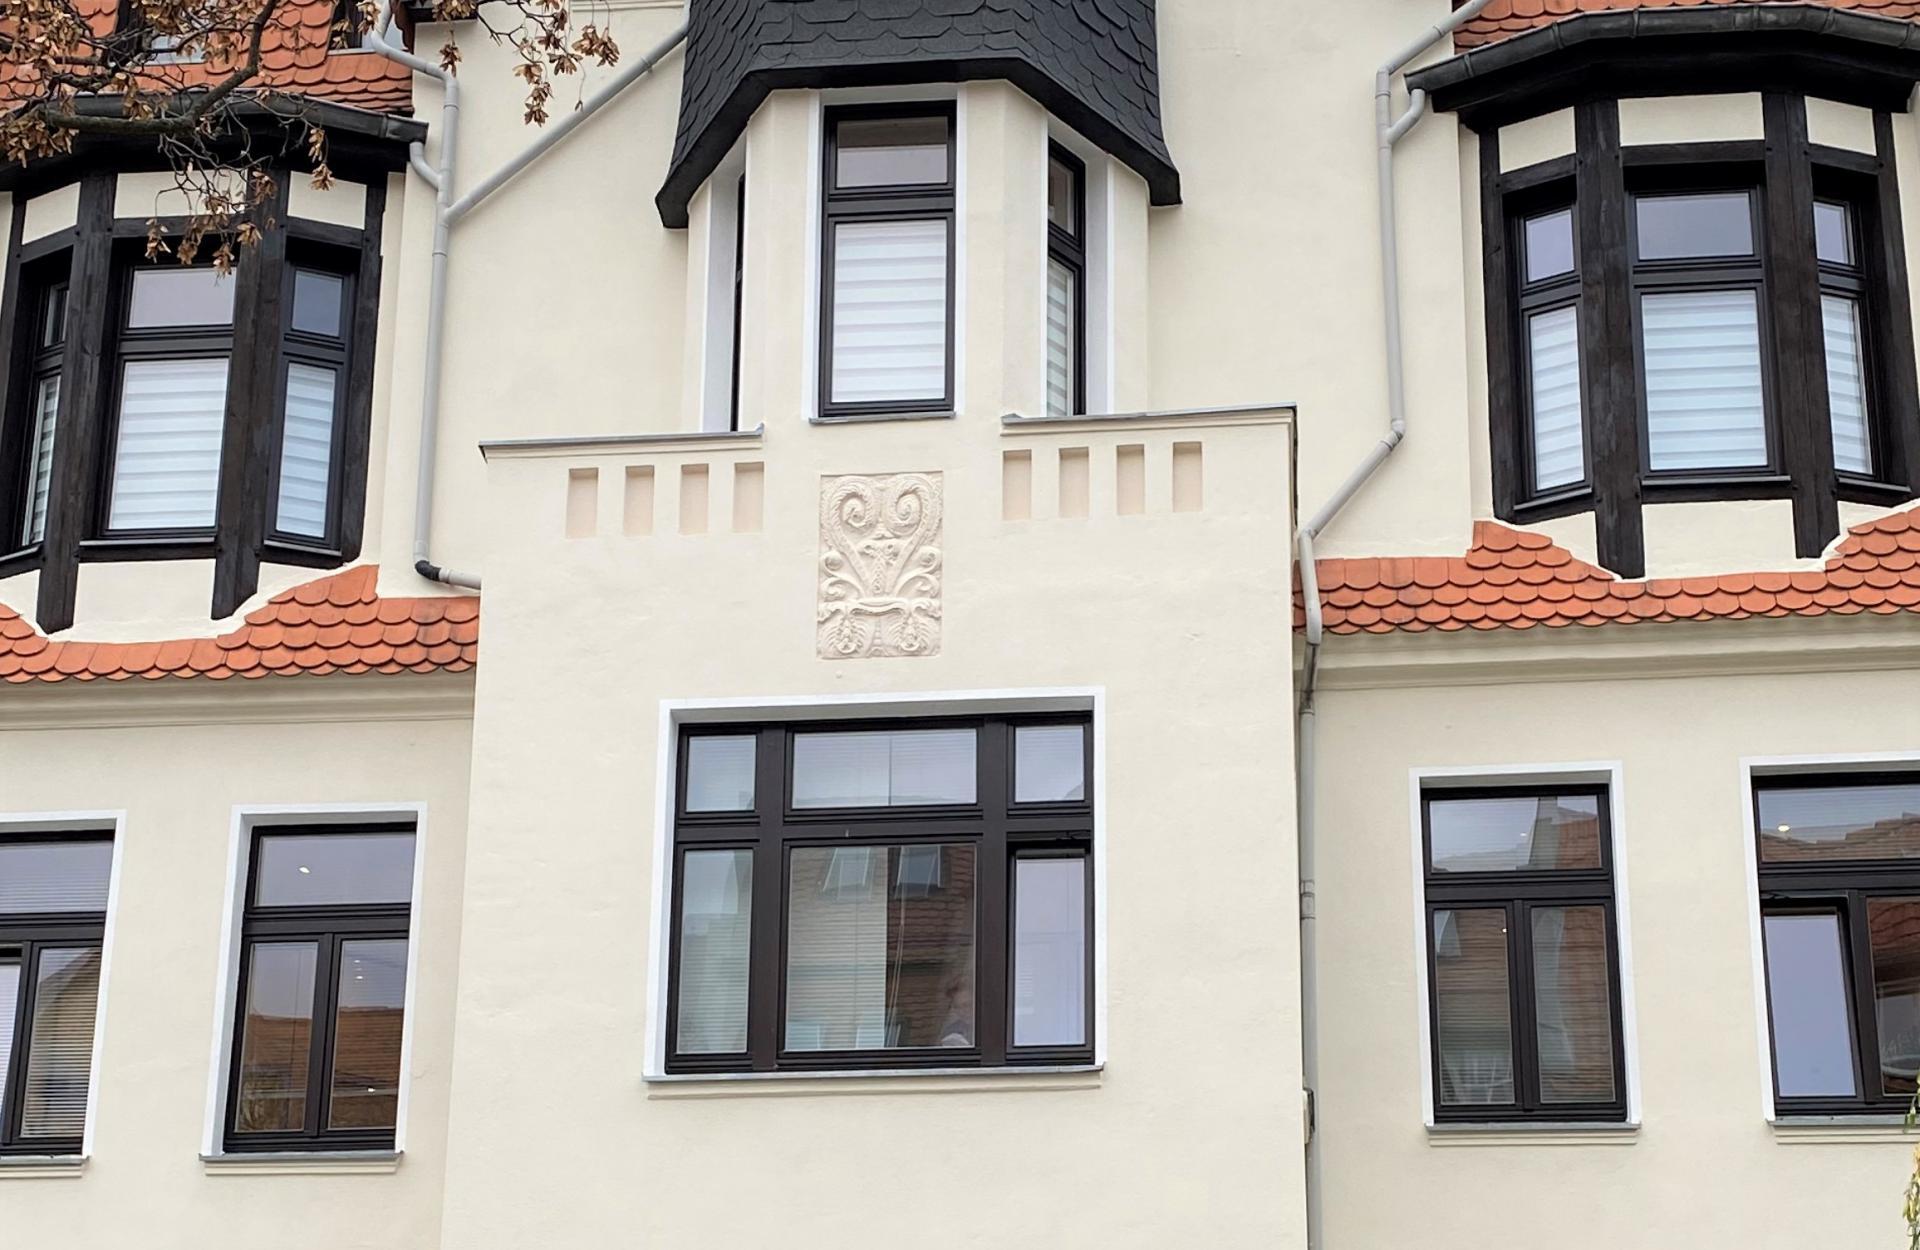 Holzfenster in Halle Röpziger Str.